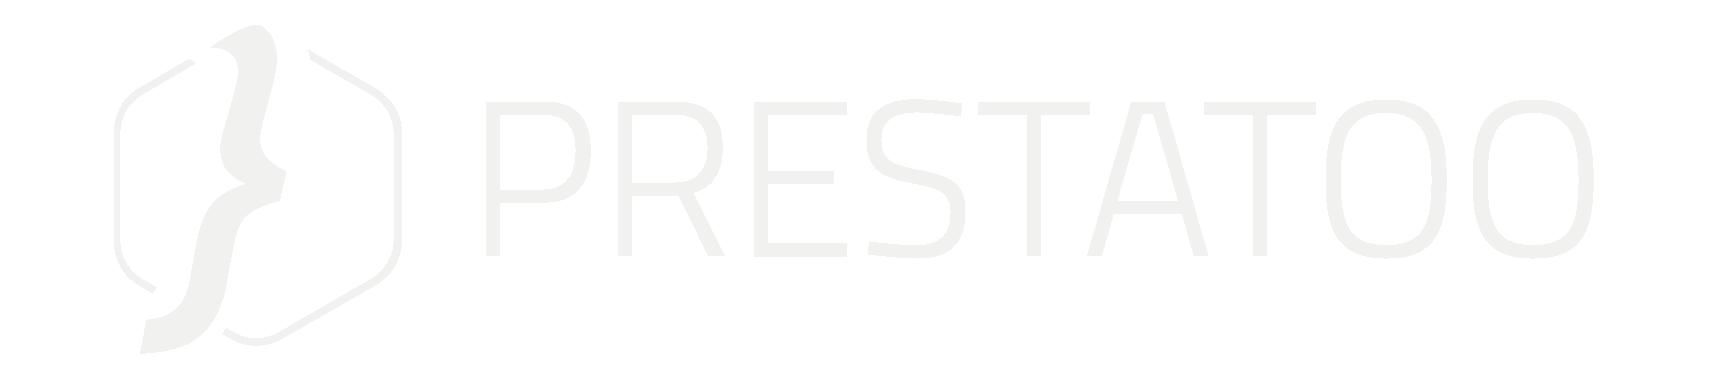 Prestatoo Création Site Web